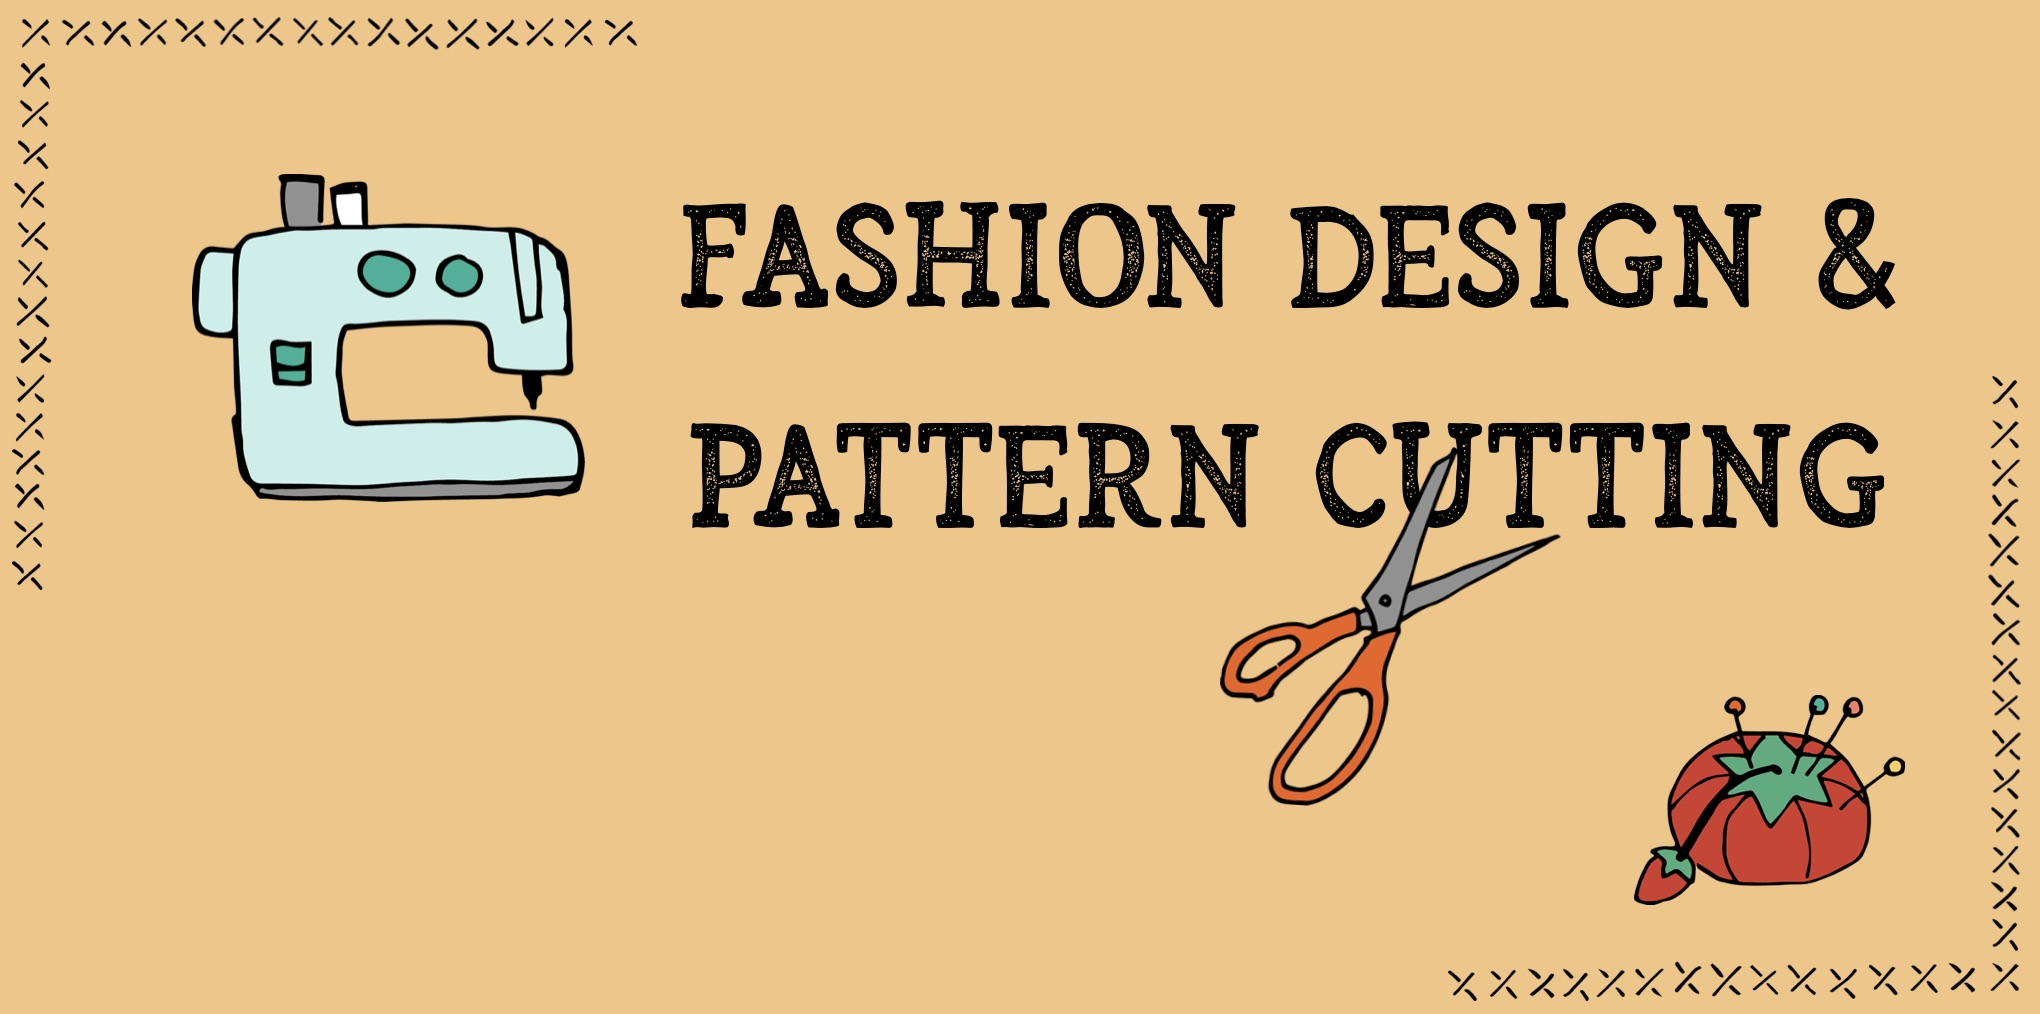 Fashion Design and Pattern Cutting